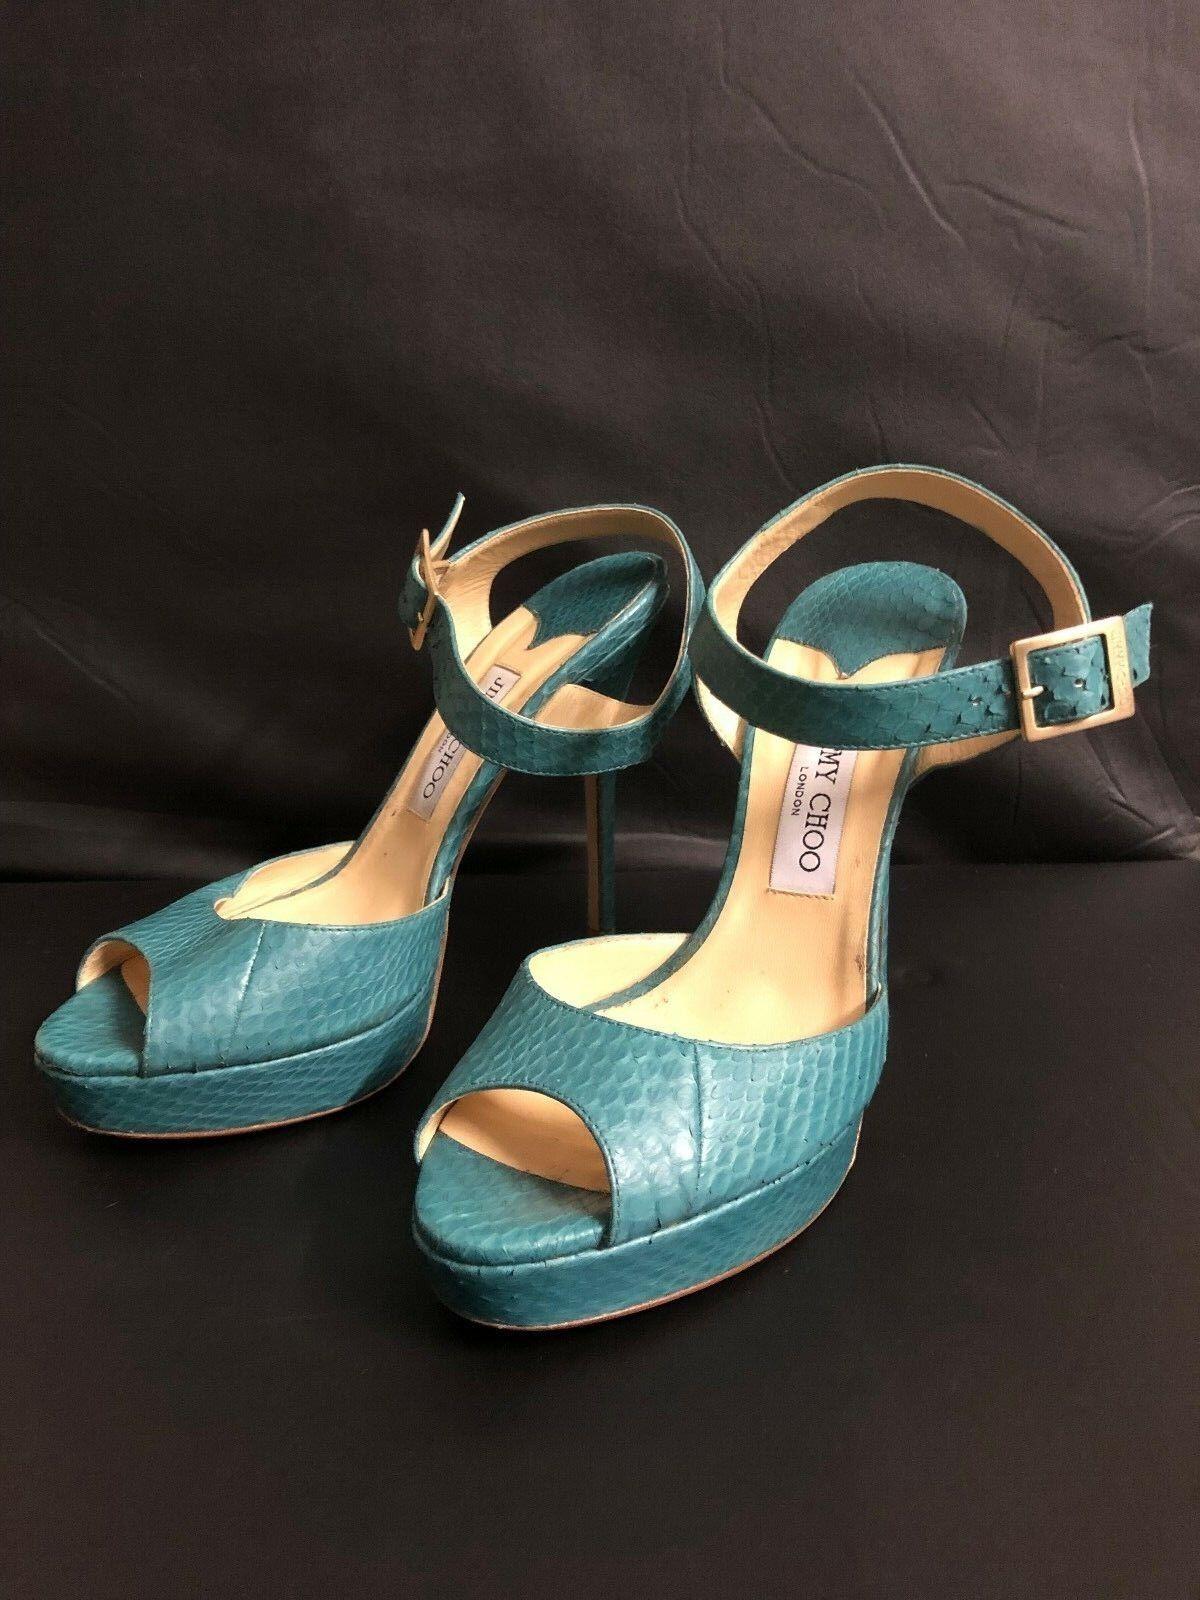 Fabuloso zapatos Jimmy Choo mujer zapatos Fabuloso talla 40-muy Casi Nuevo cc5959